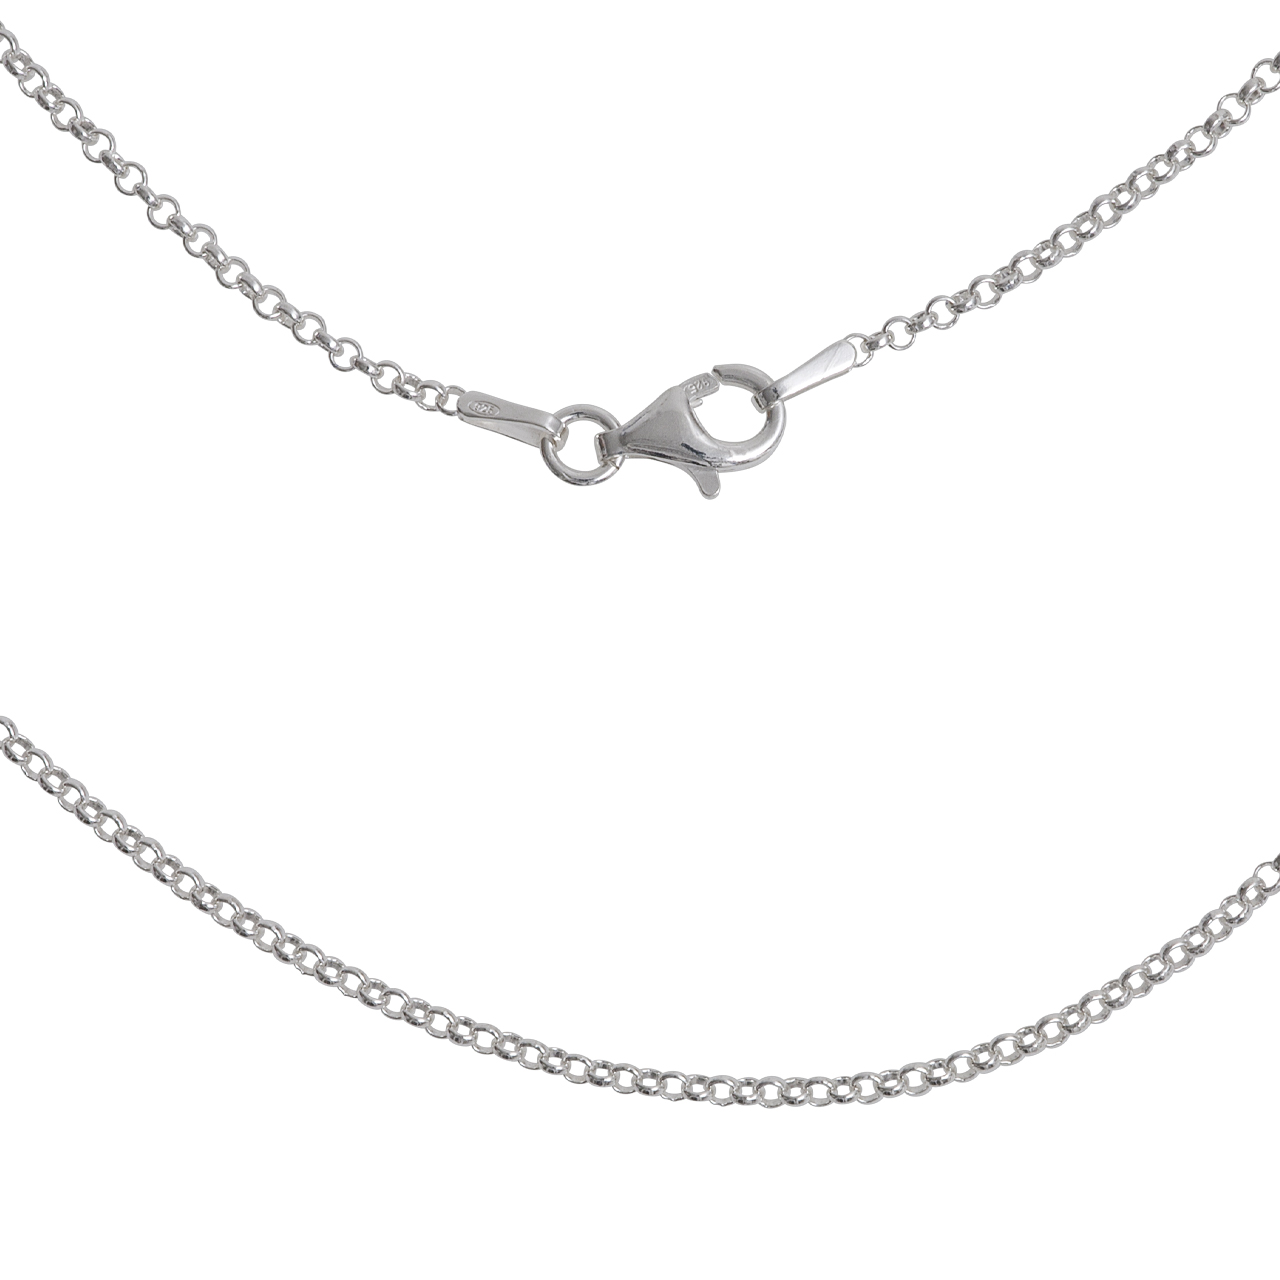 Silber-Kette, 42cm